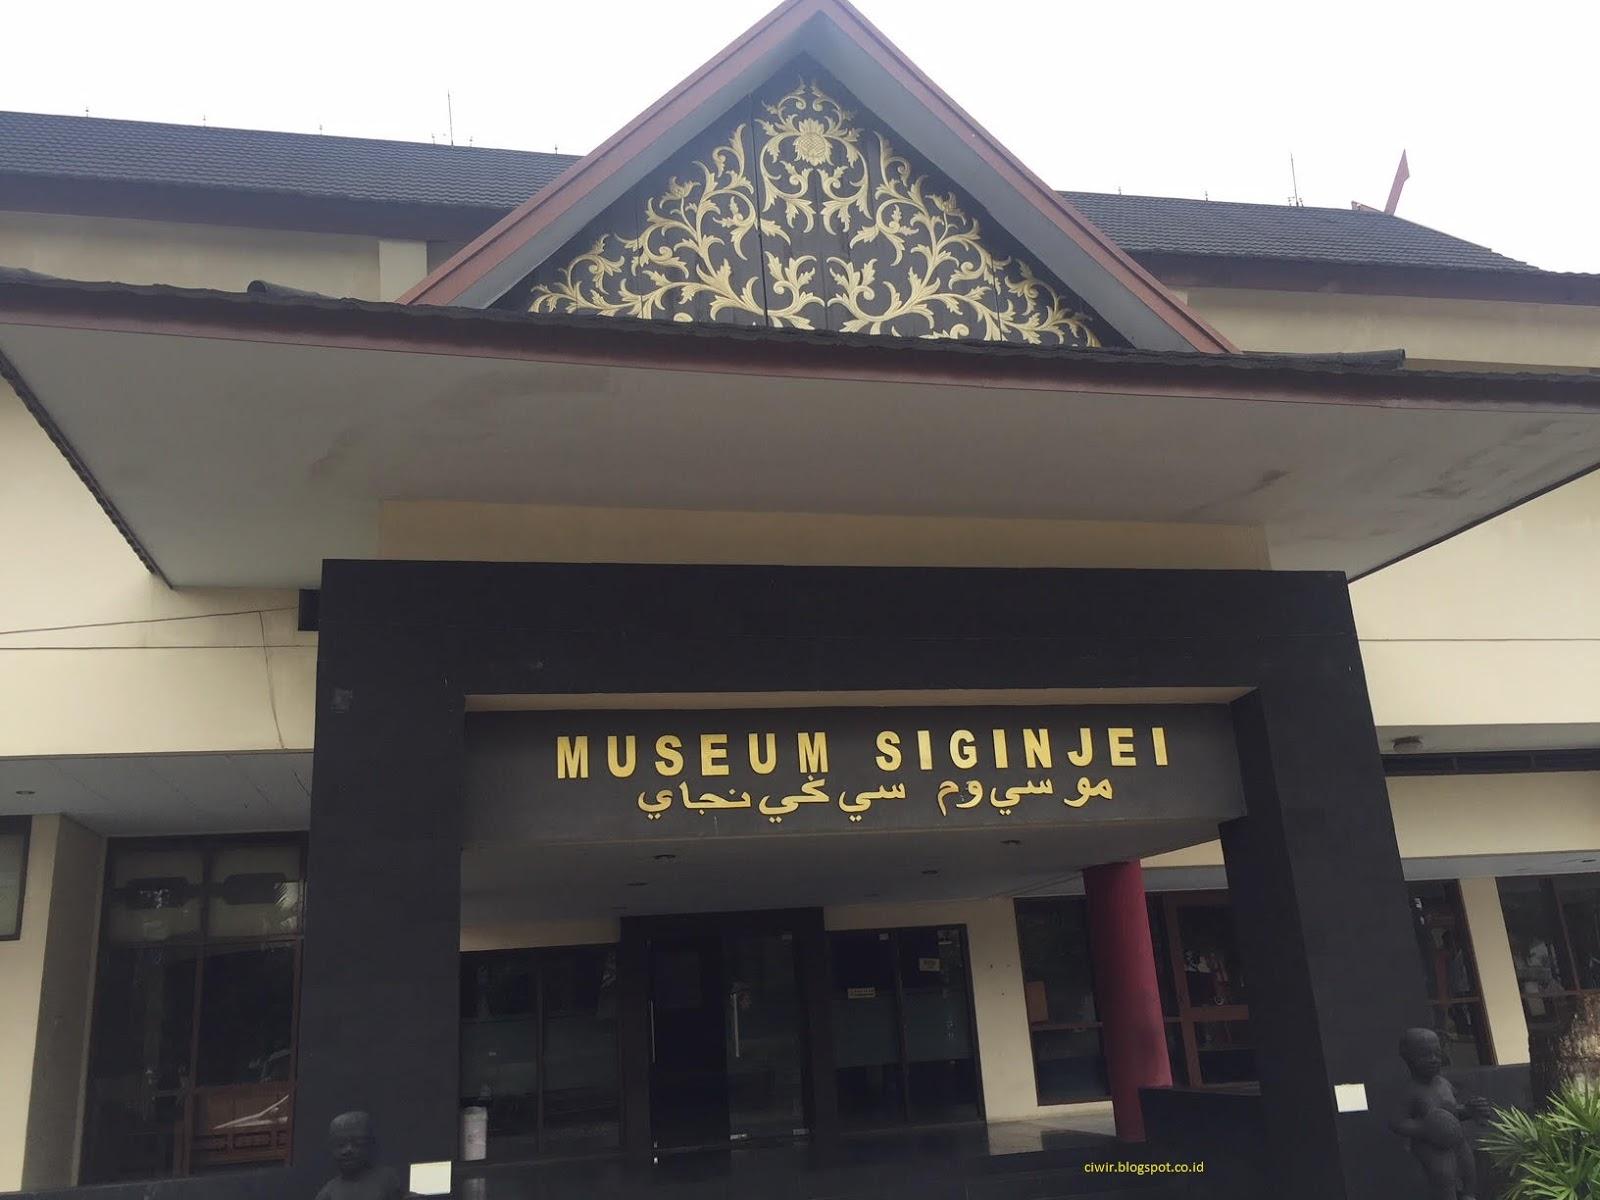 Museum Siginjei Jambi Catatan Kaum Biasa Awalnya Bernama Negeri Dibangun